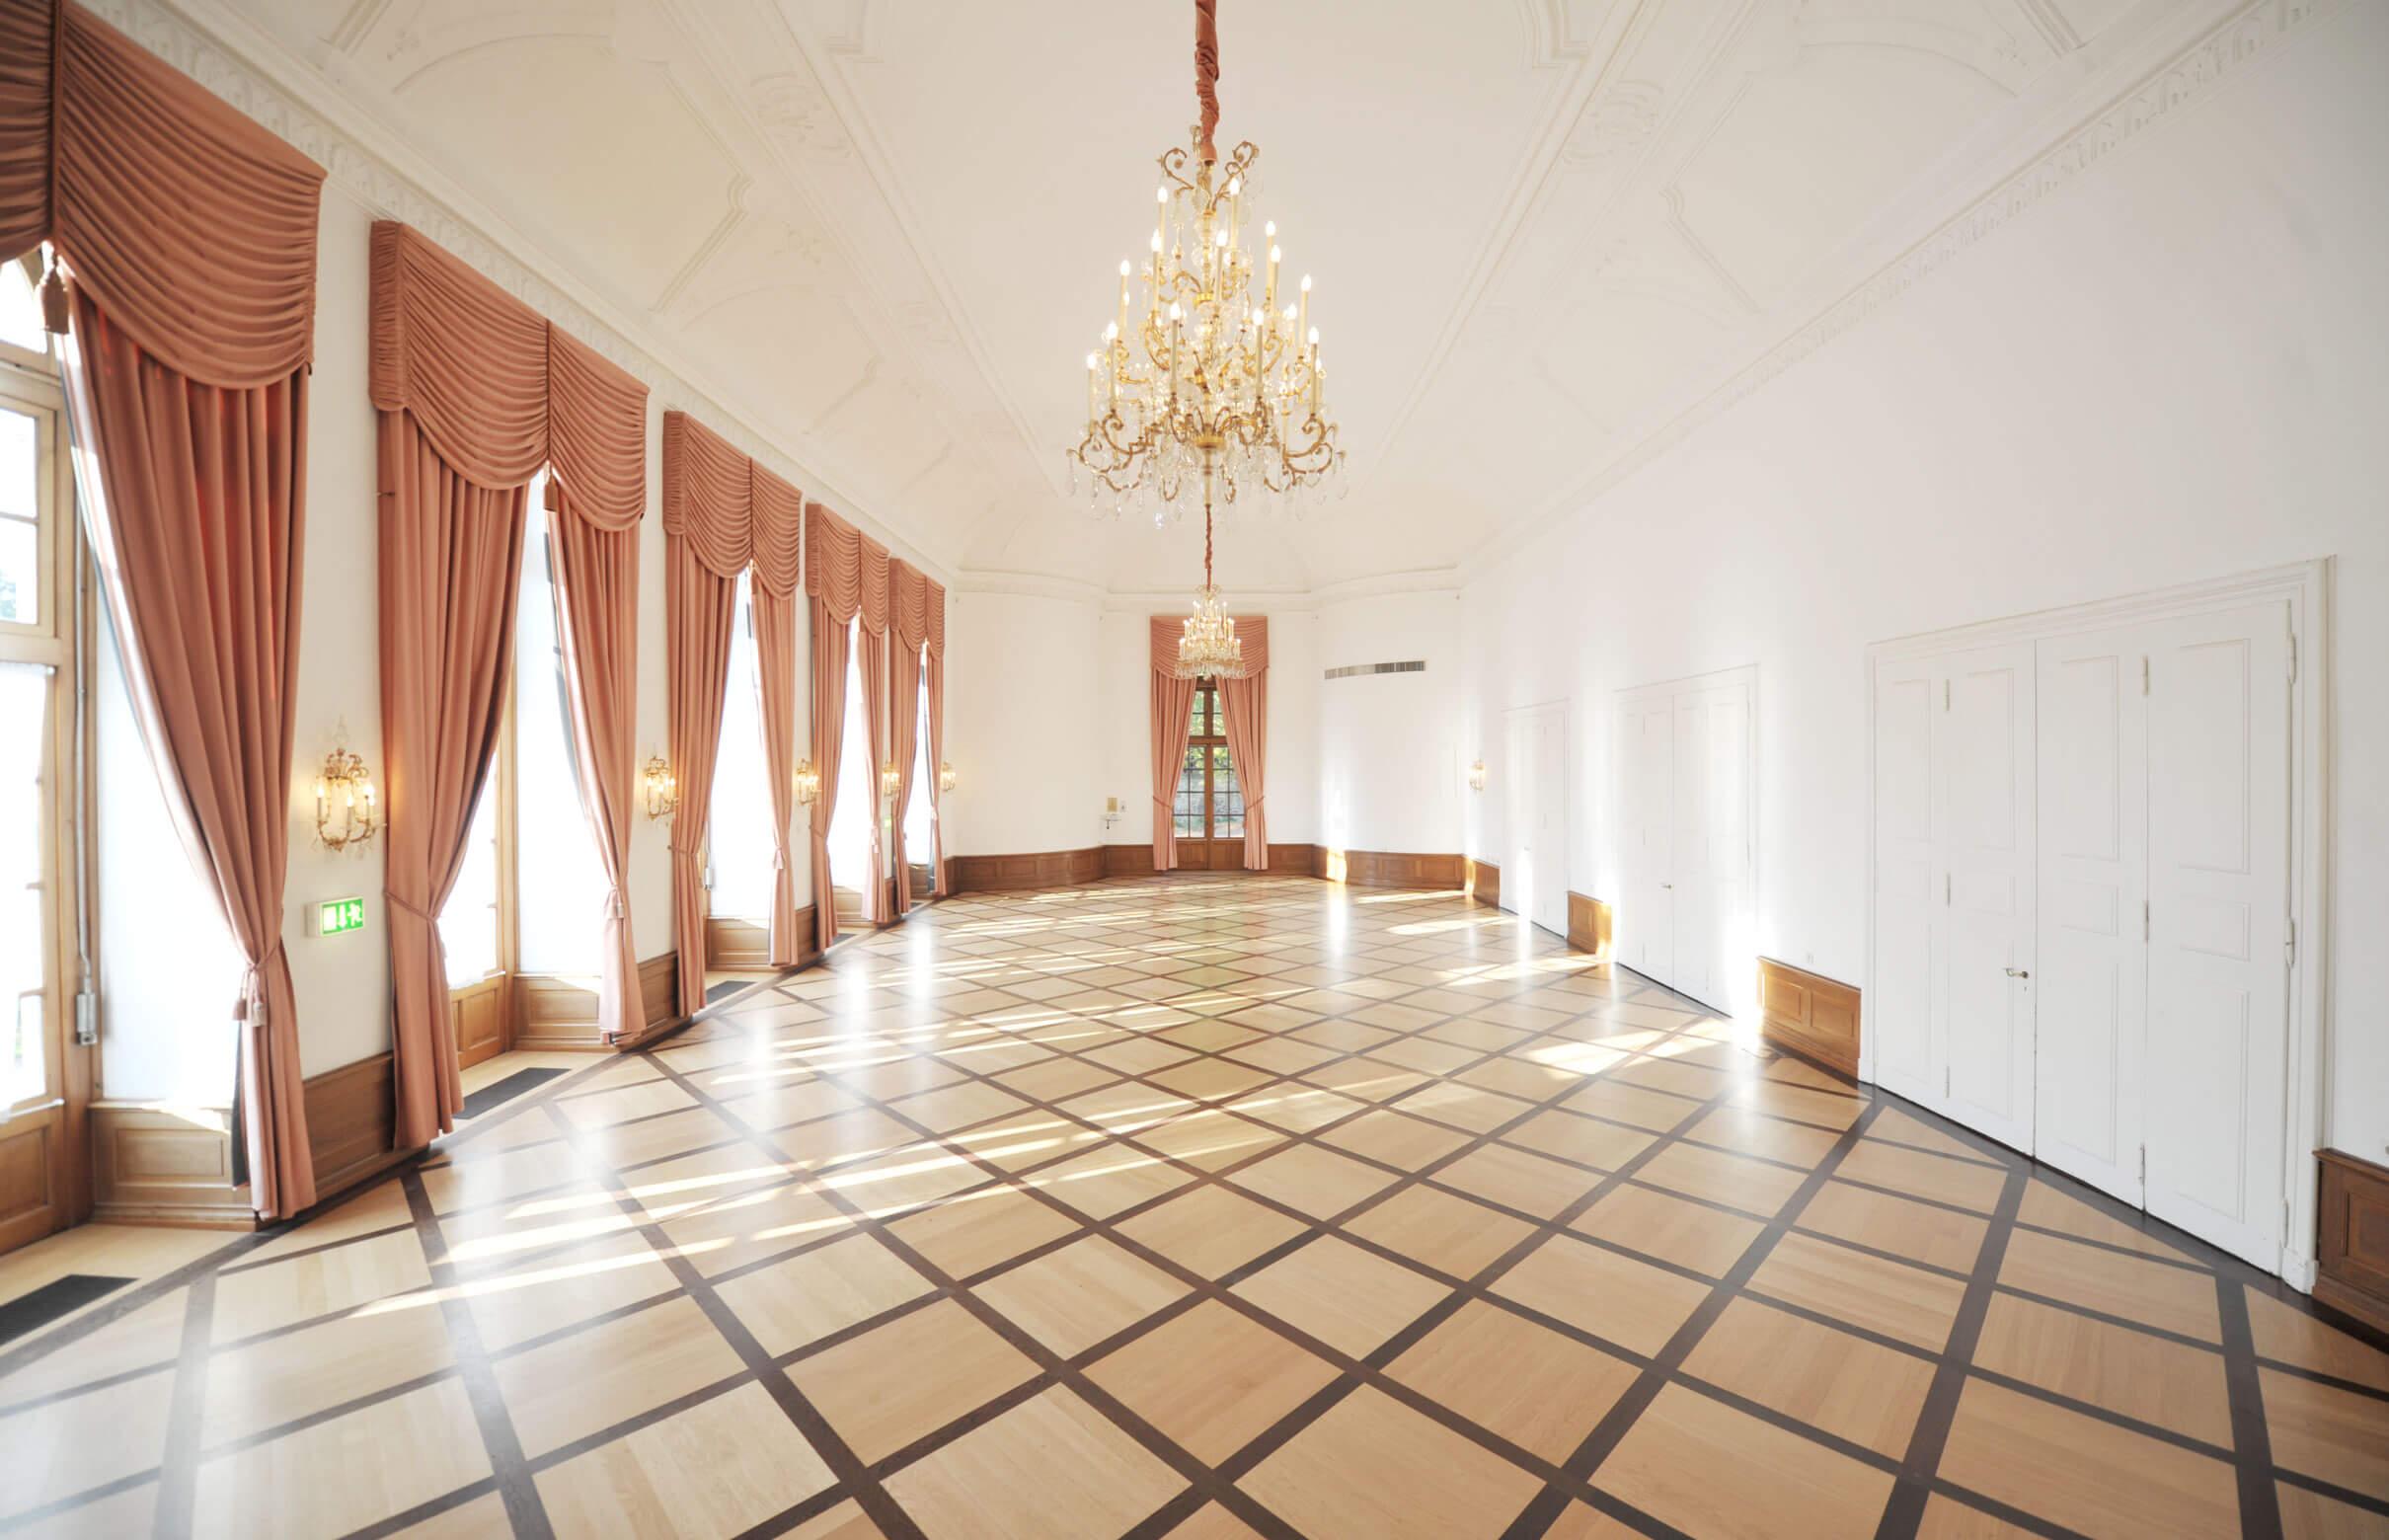 Damian Werner - ltbausanierung-Orangerie-Fulda_Hotel-Maritim-Roter-Saal